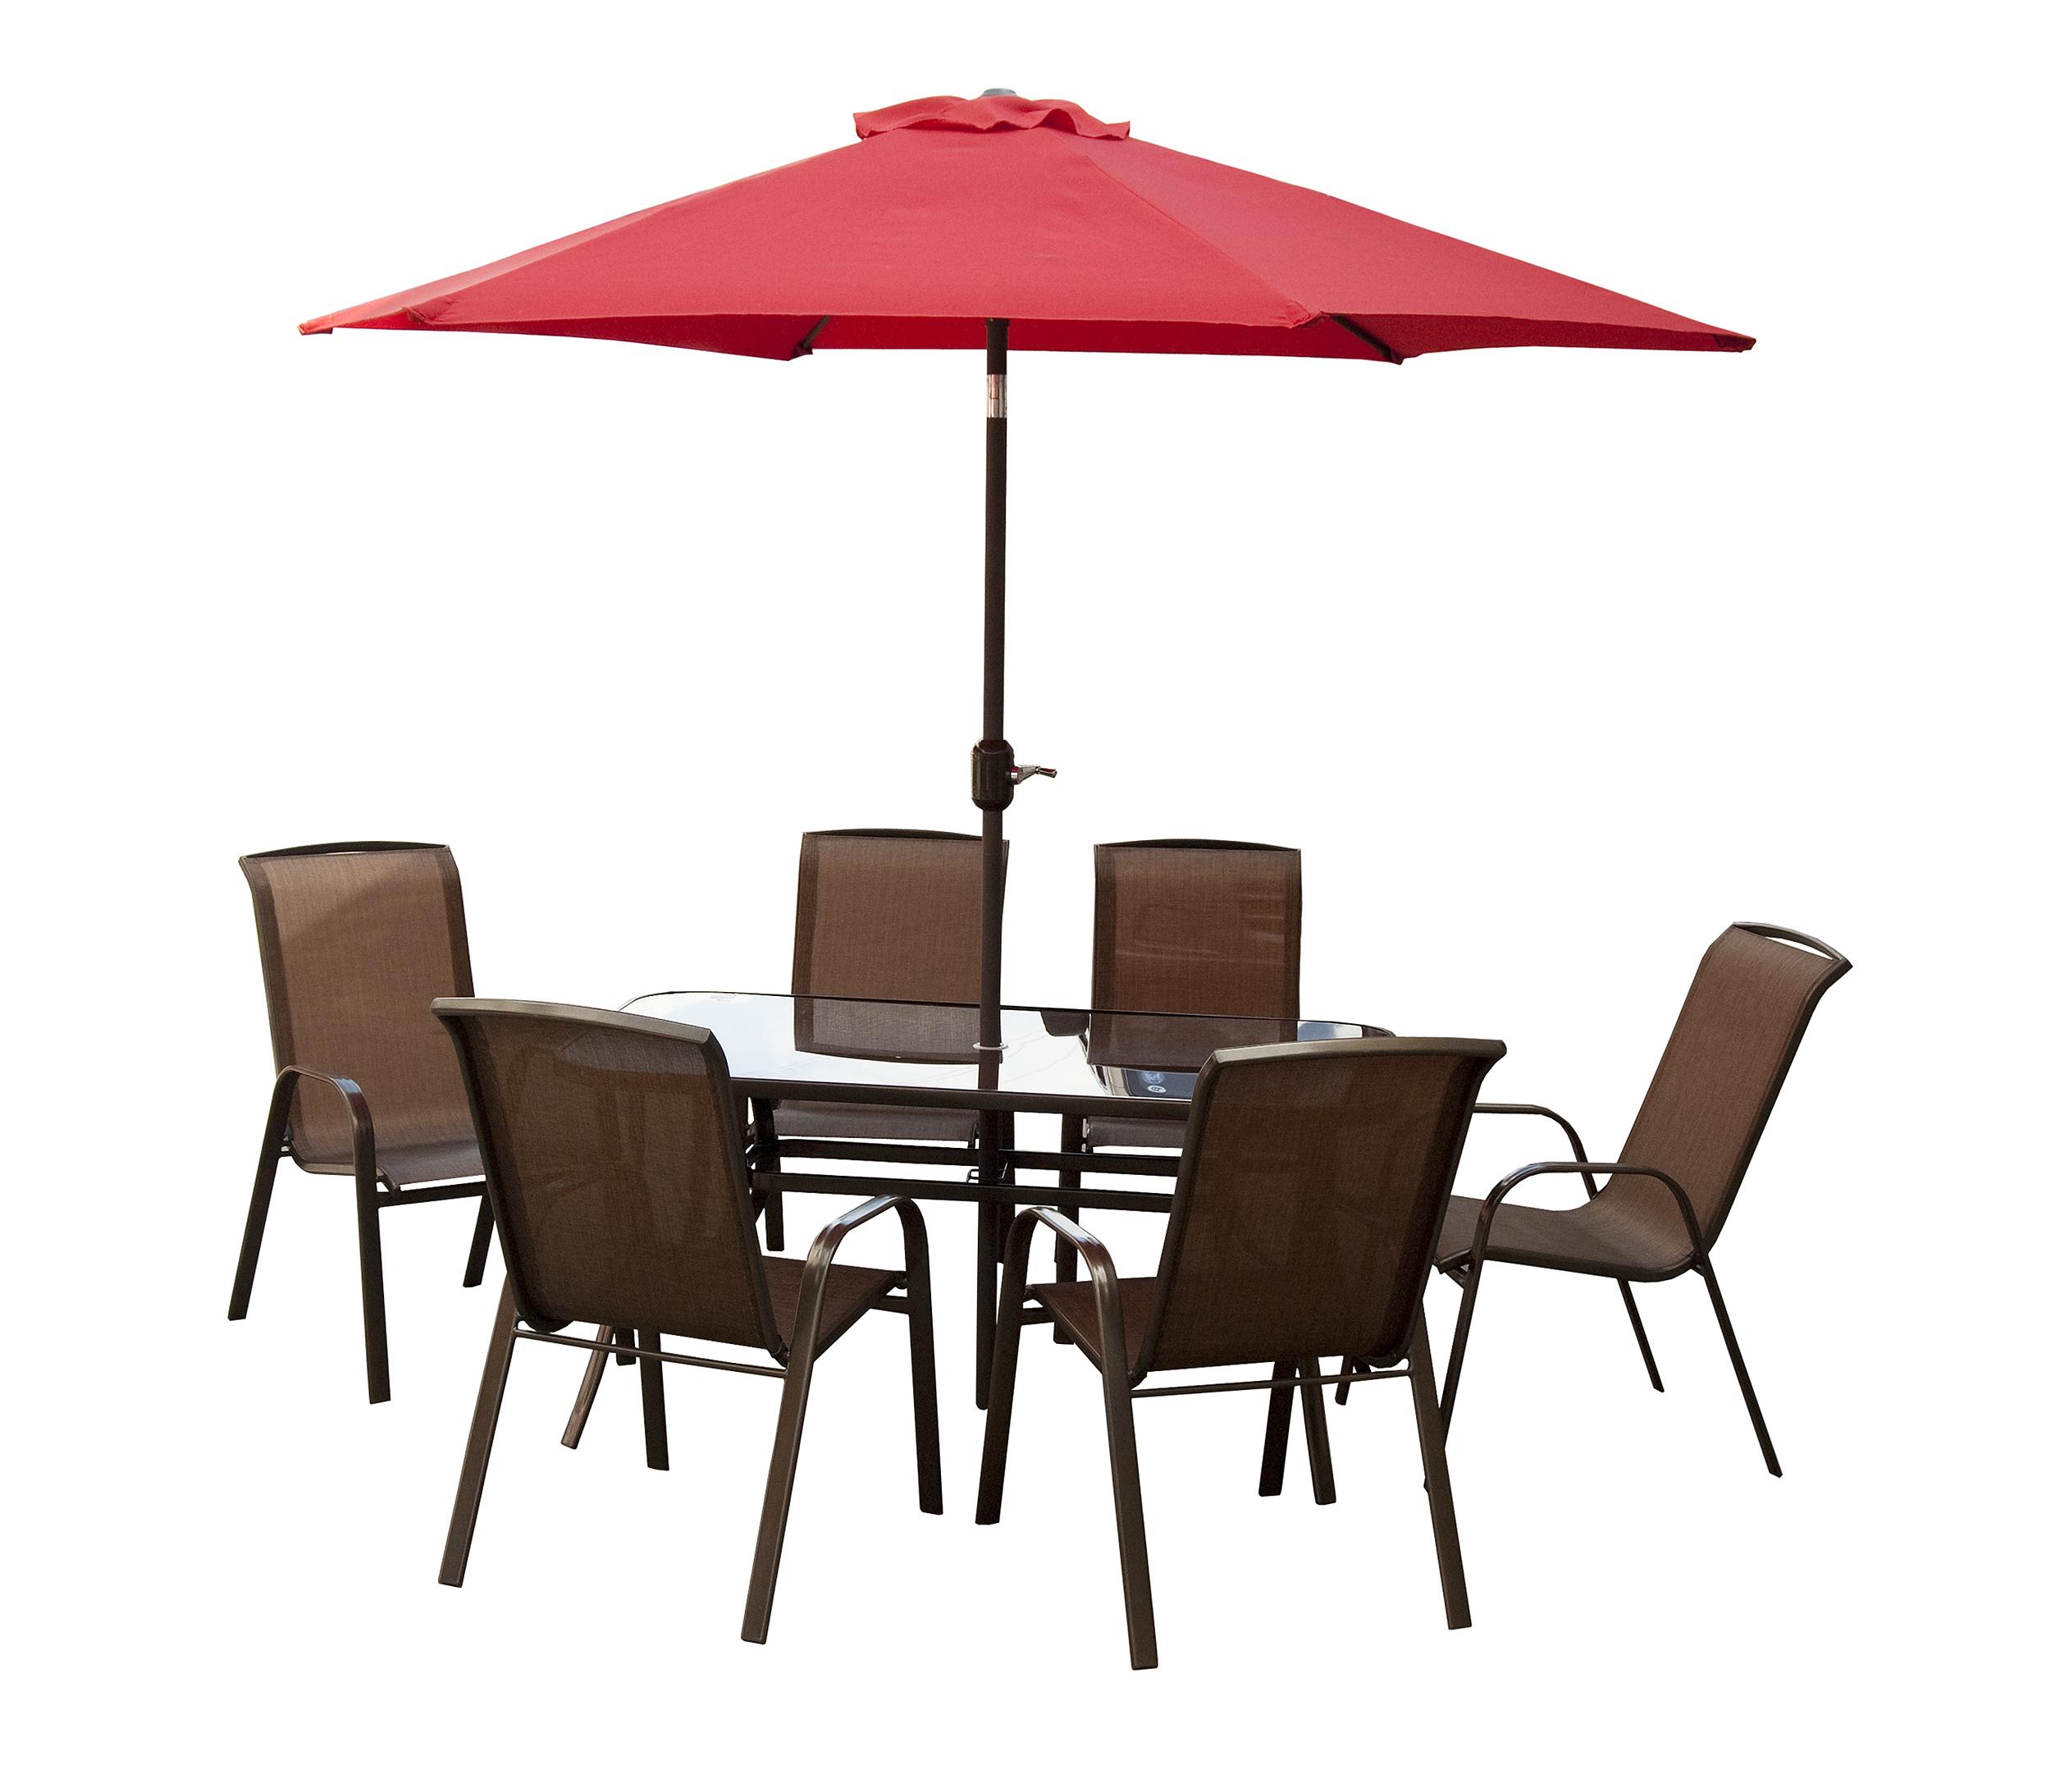 Merveilleux Courtyard Ashford 8 Piece Patio Furniture Set